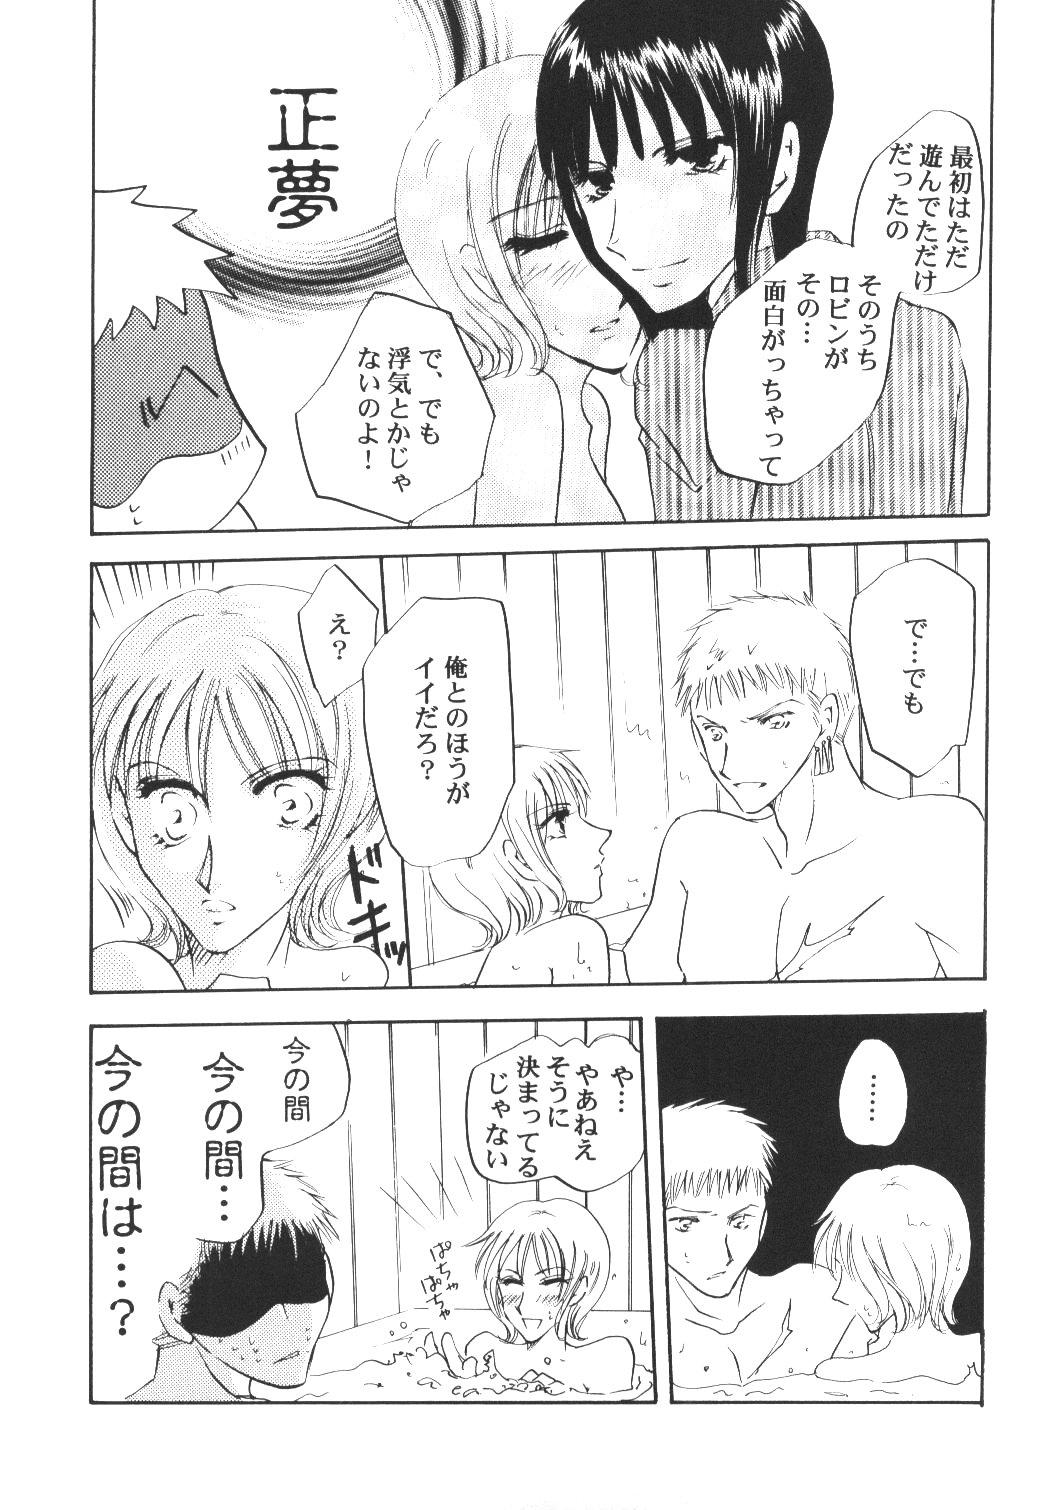 Yume Ichiya 2 155